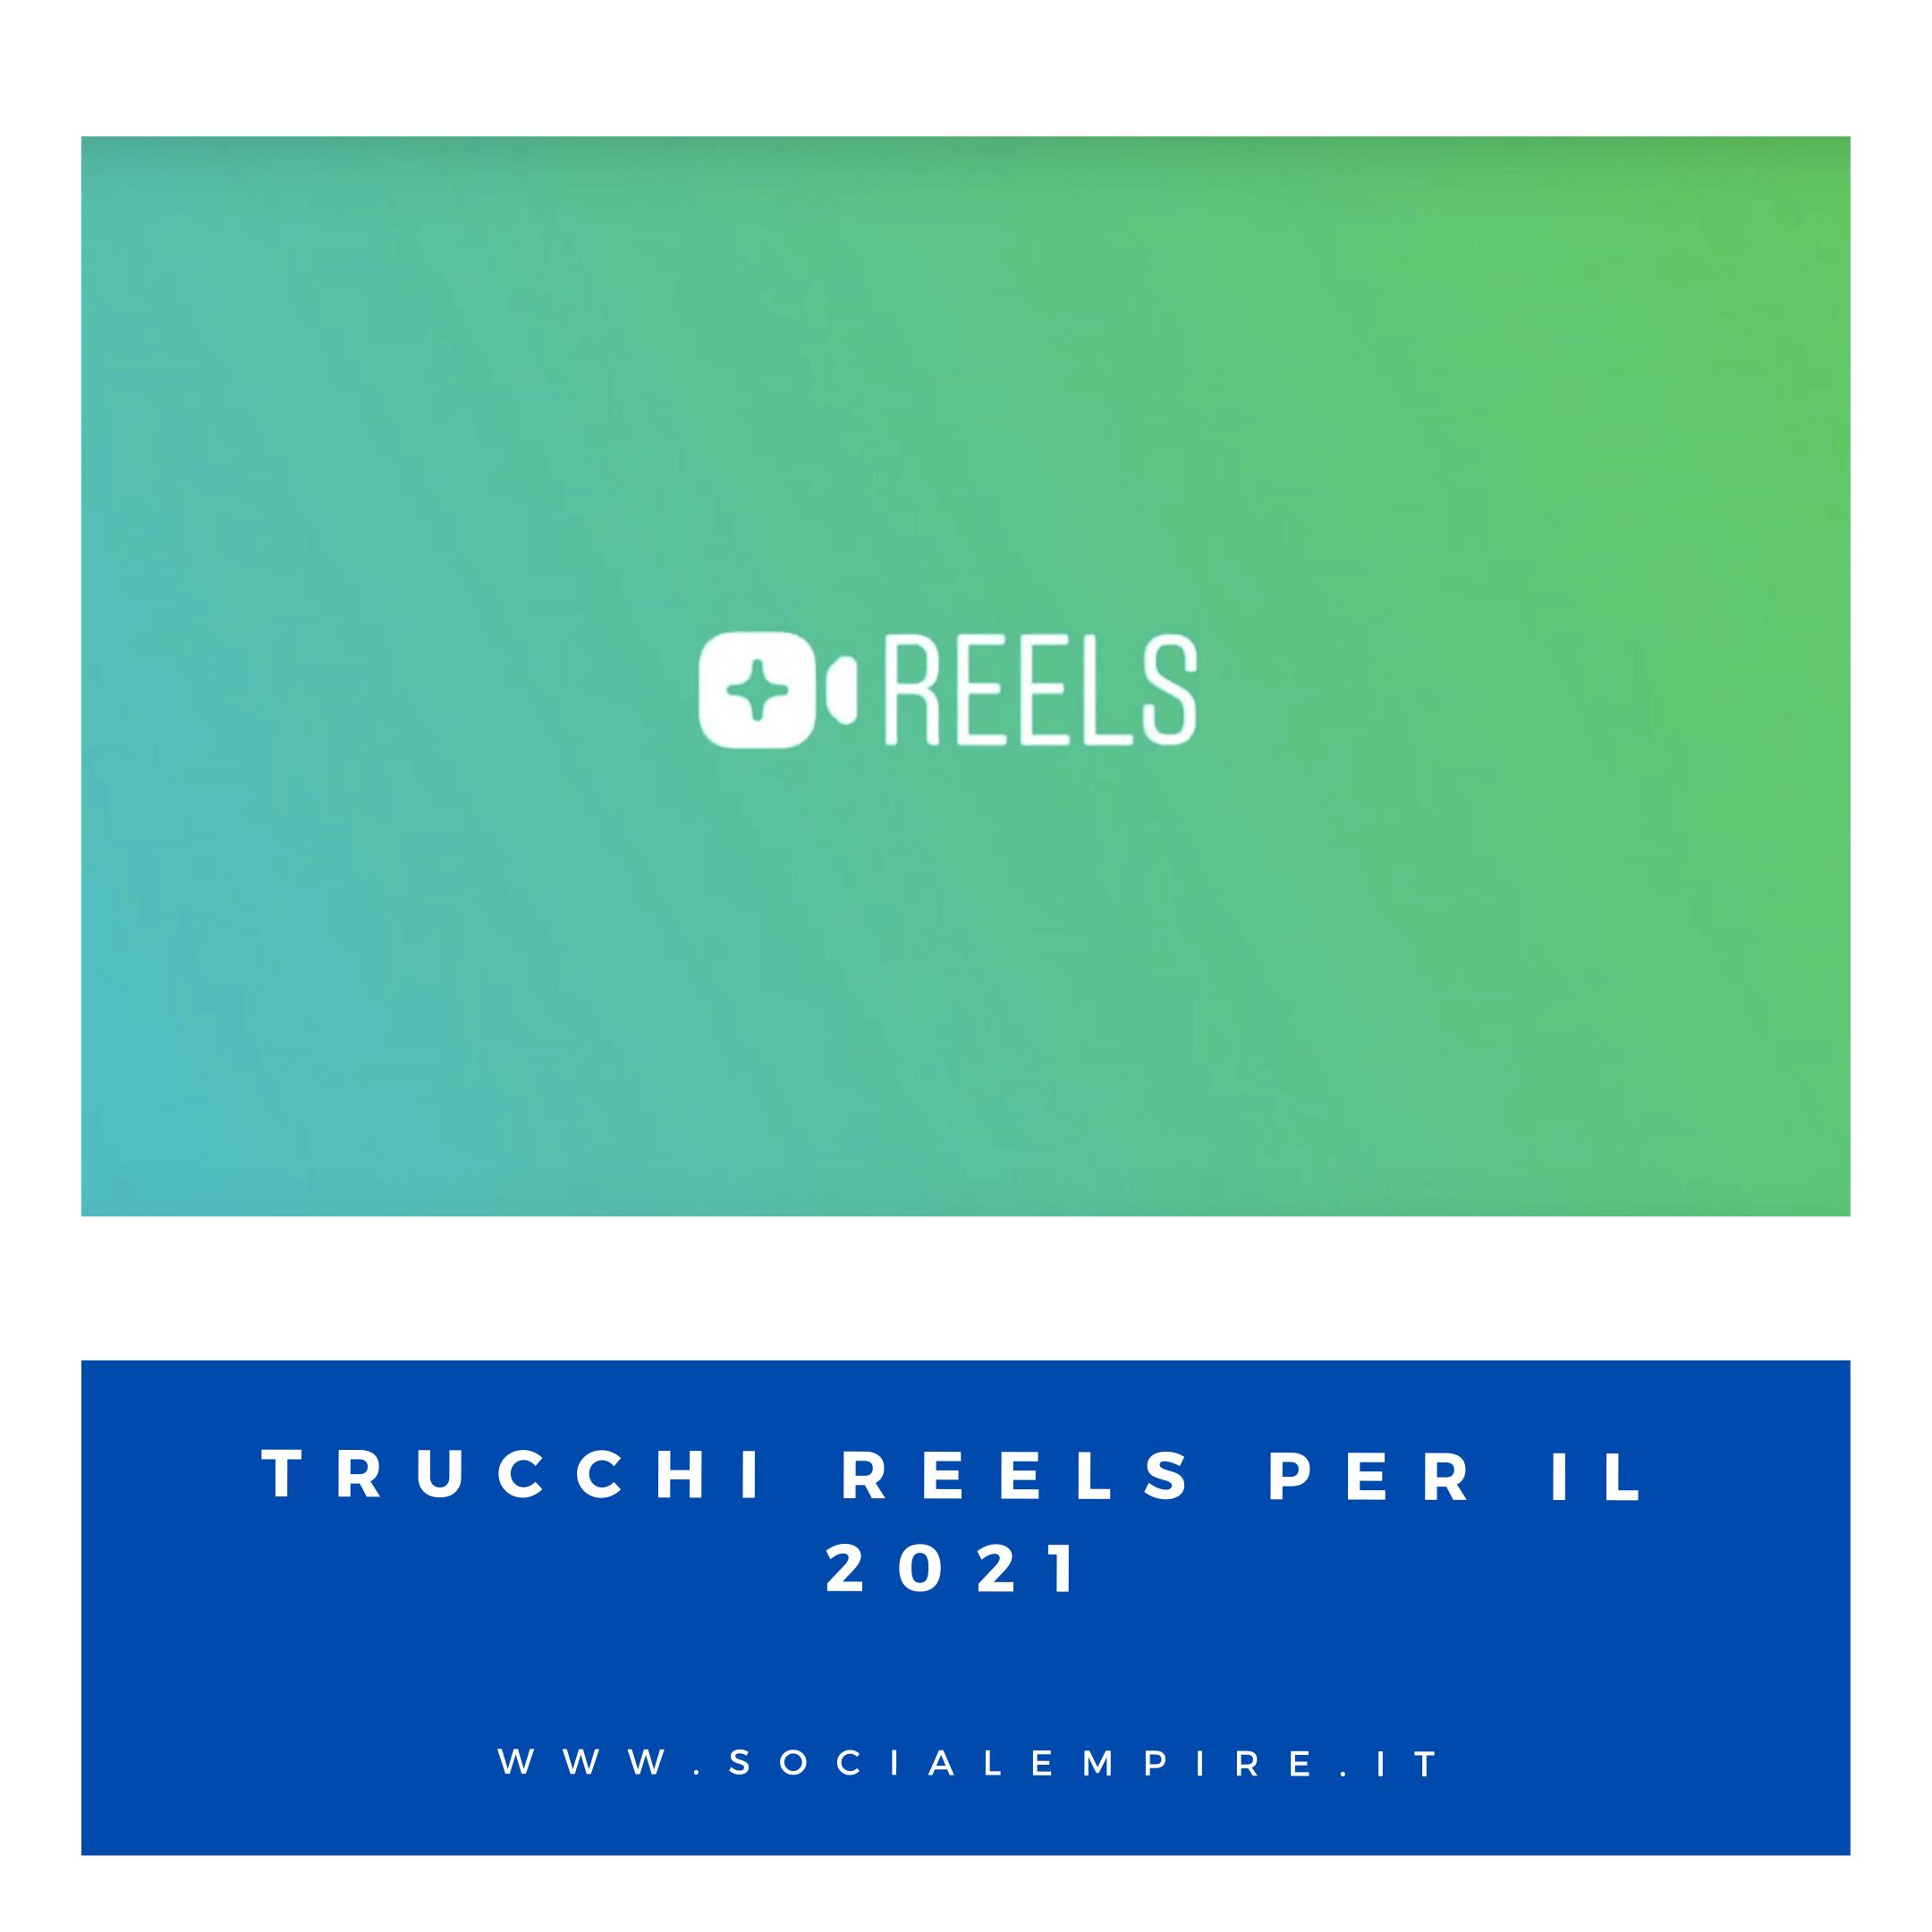 Trucchi Reels Instagram